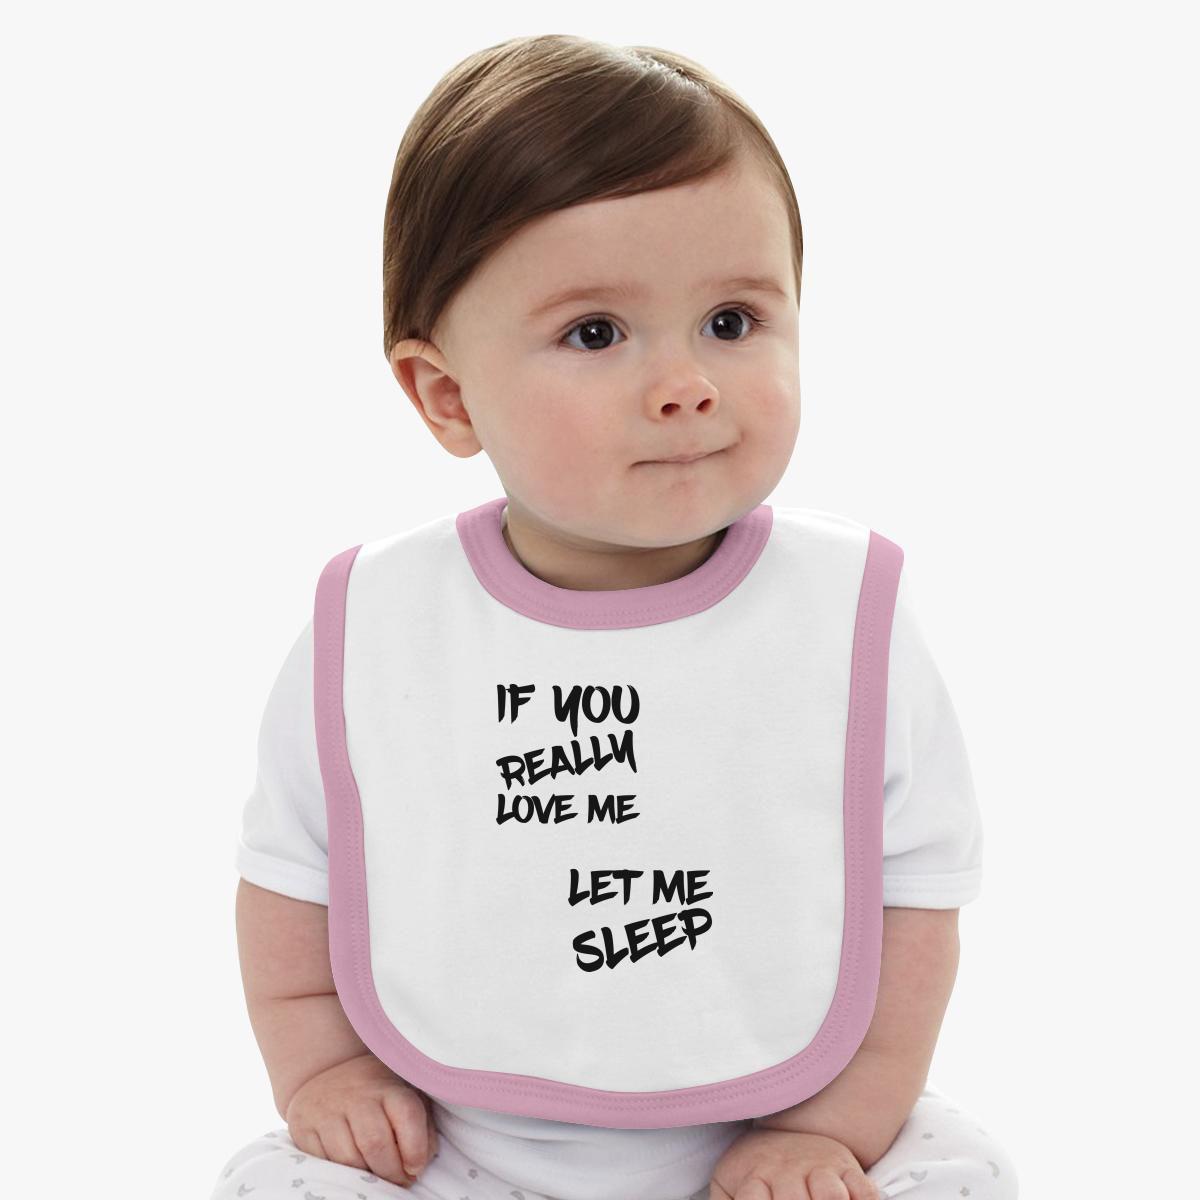 Let me sleep Baby Bib - Customon